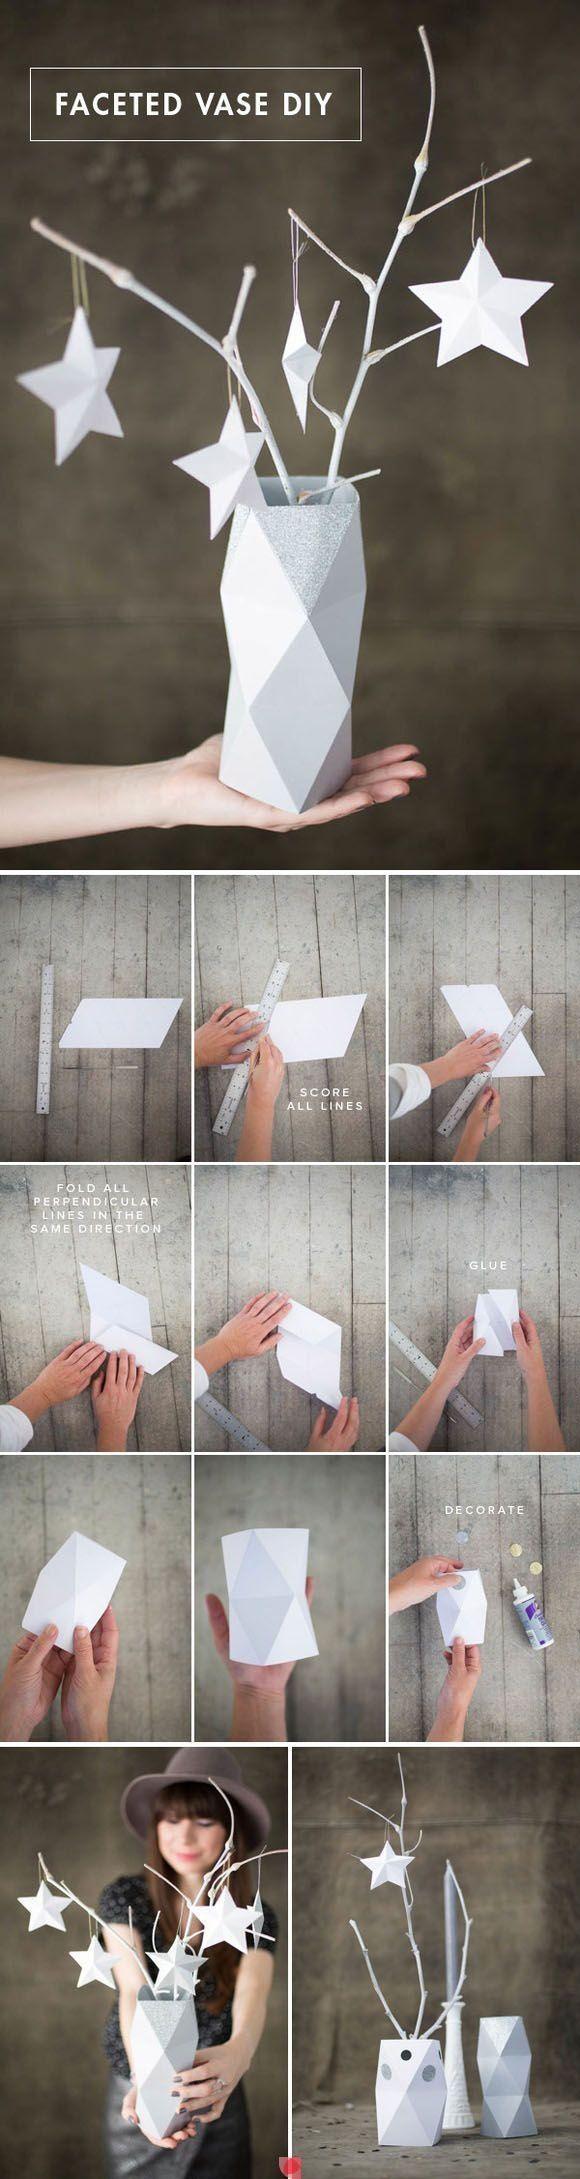 Ваза из картона своими руками. Для декора дома